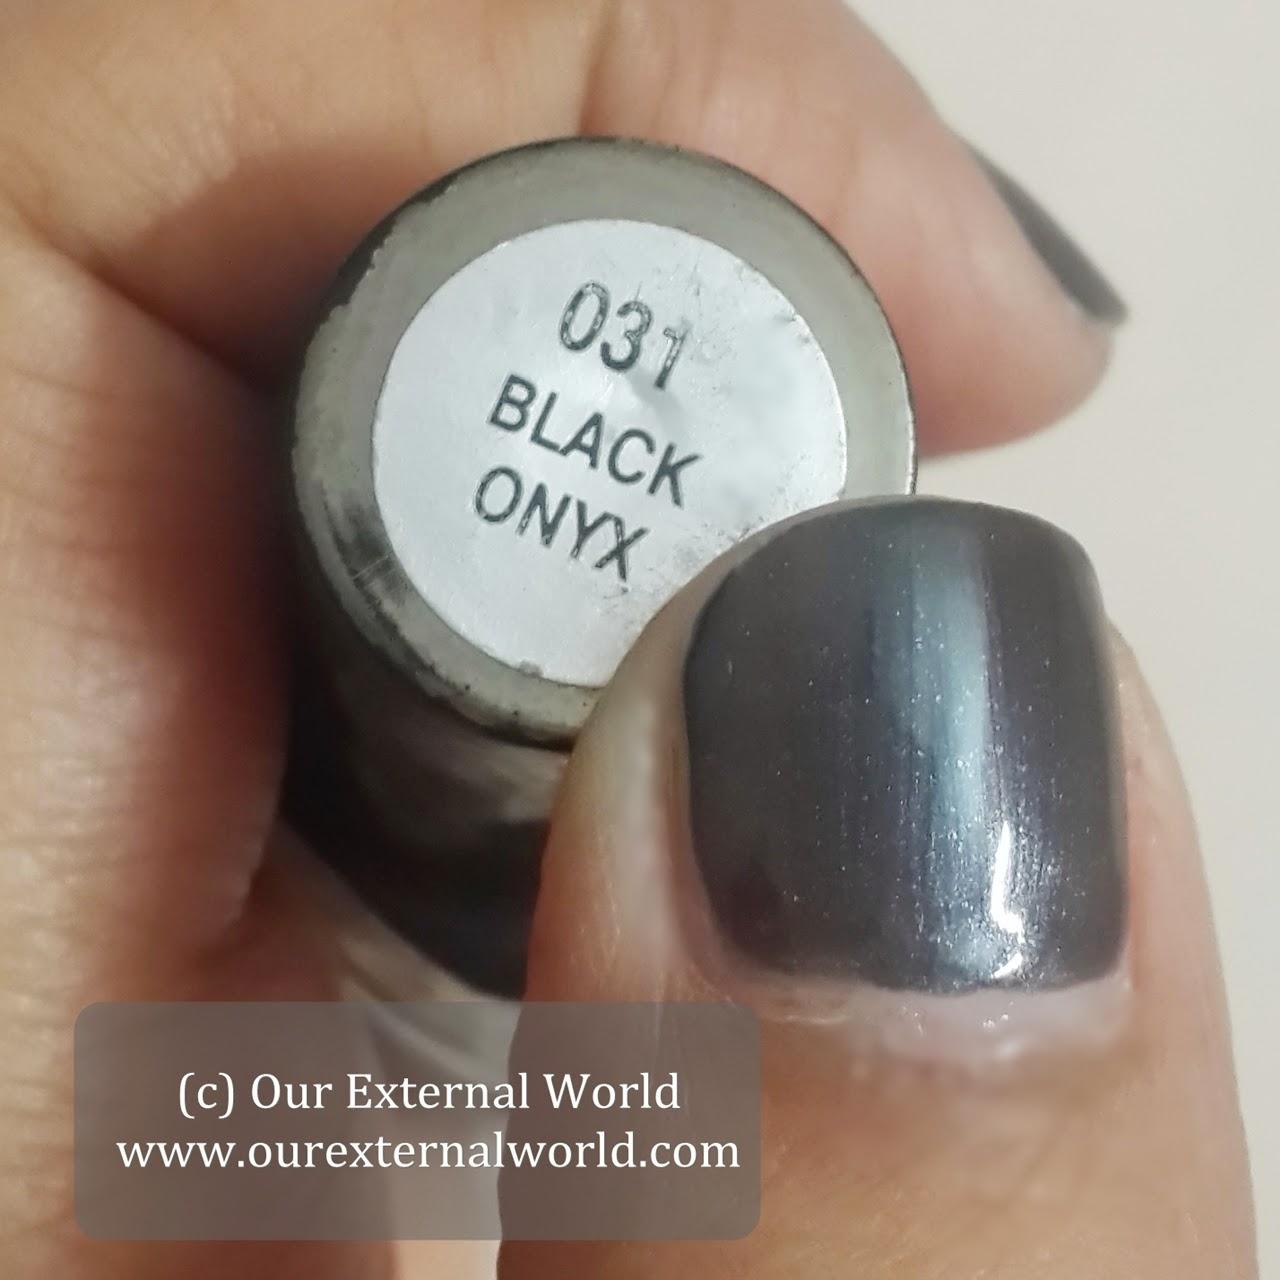 EN-VY Nail Polish - Black Onyx Swatches, review, price